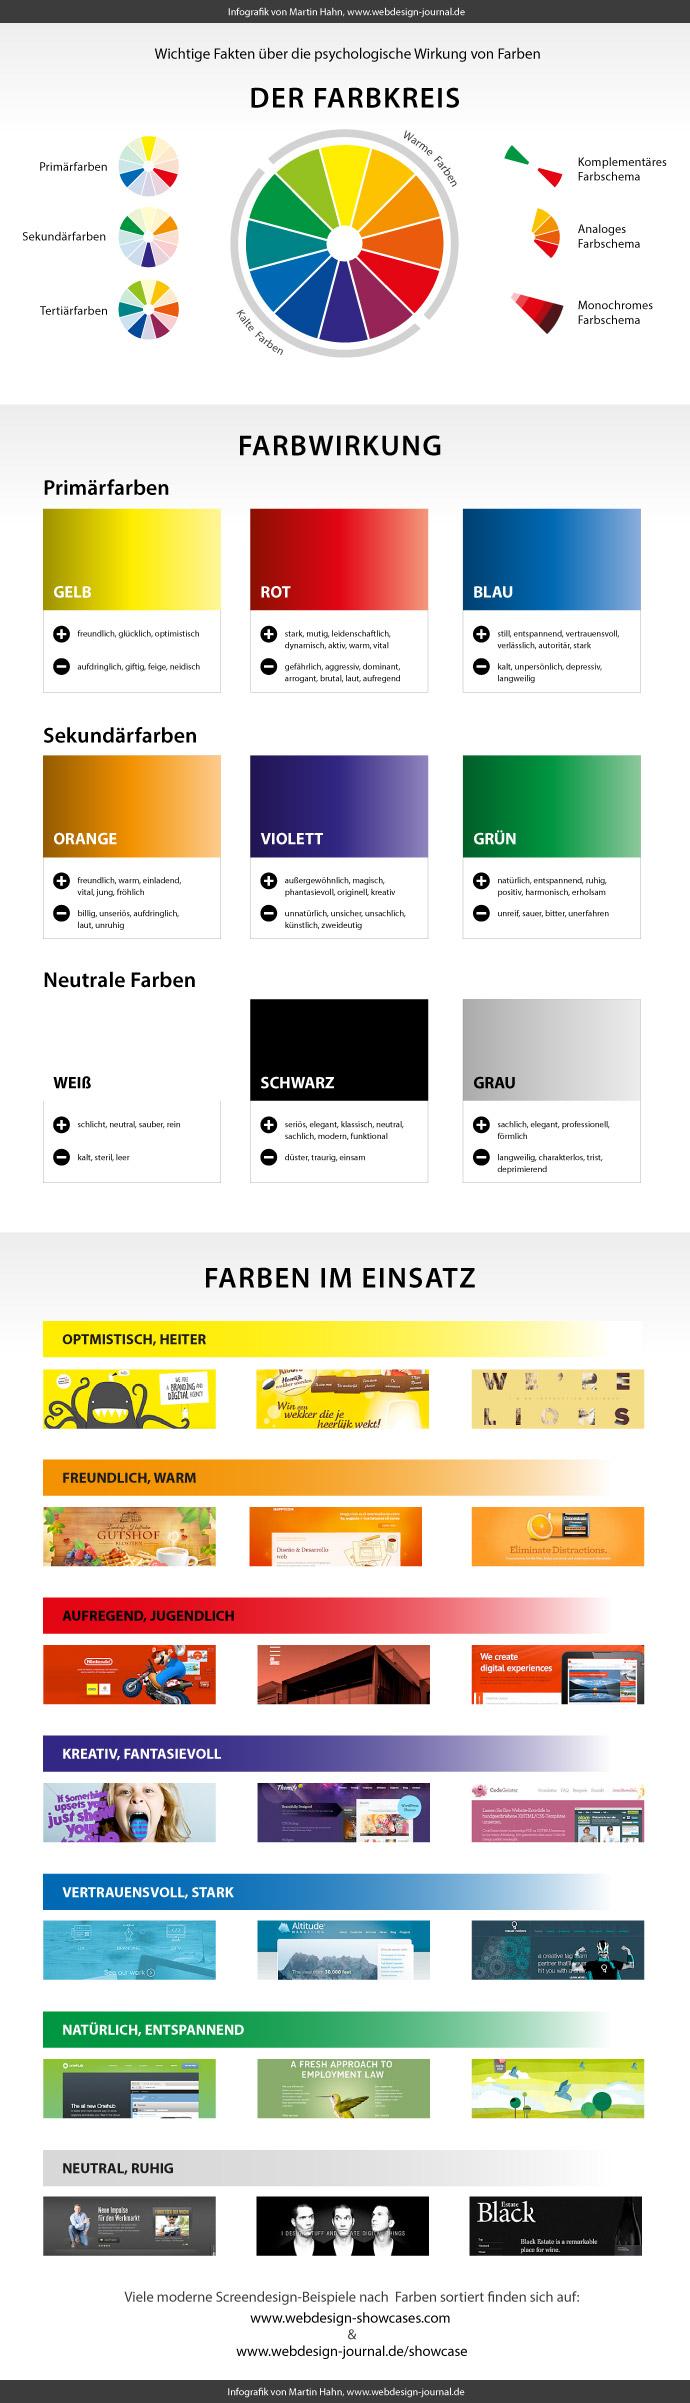 Infografik Farbkreis & Farbwirkung